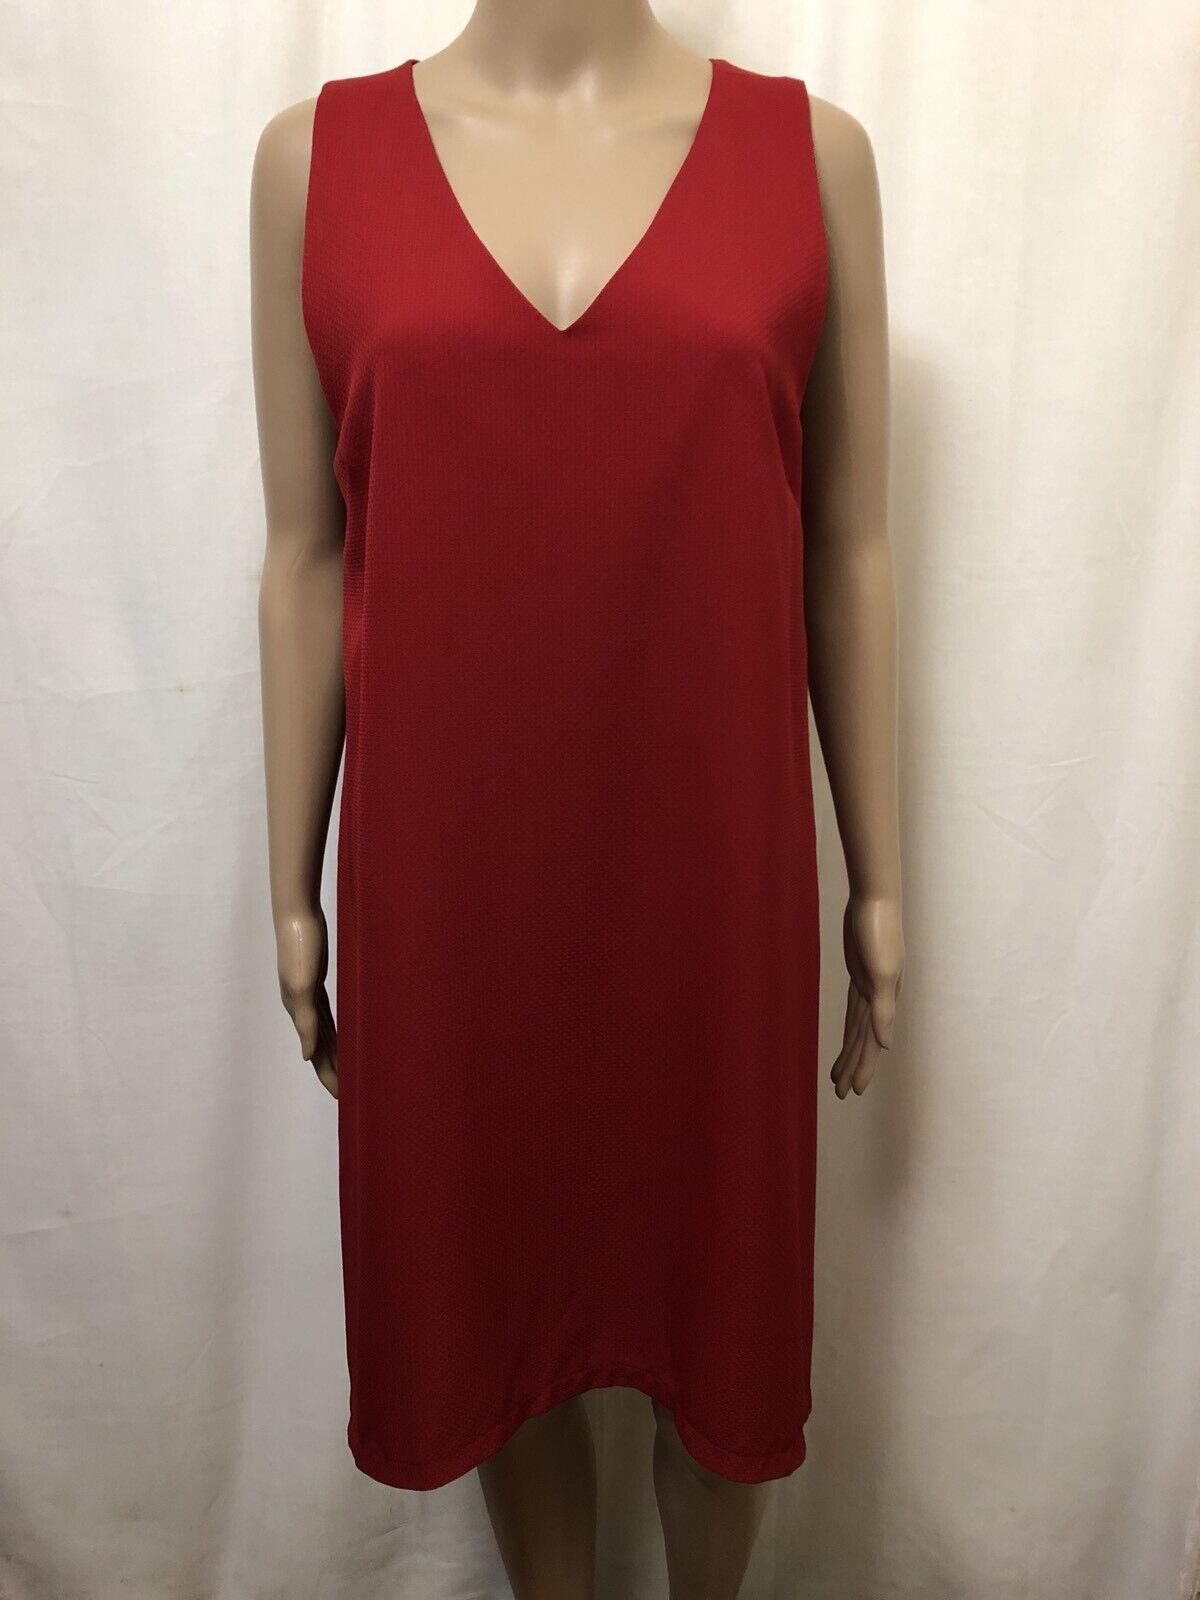 KUWAII Dress Womens  Size 10  New w  Tags   Nucleus Dress   Textured Fabric